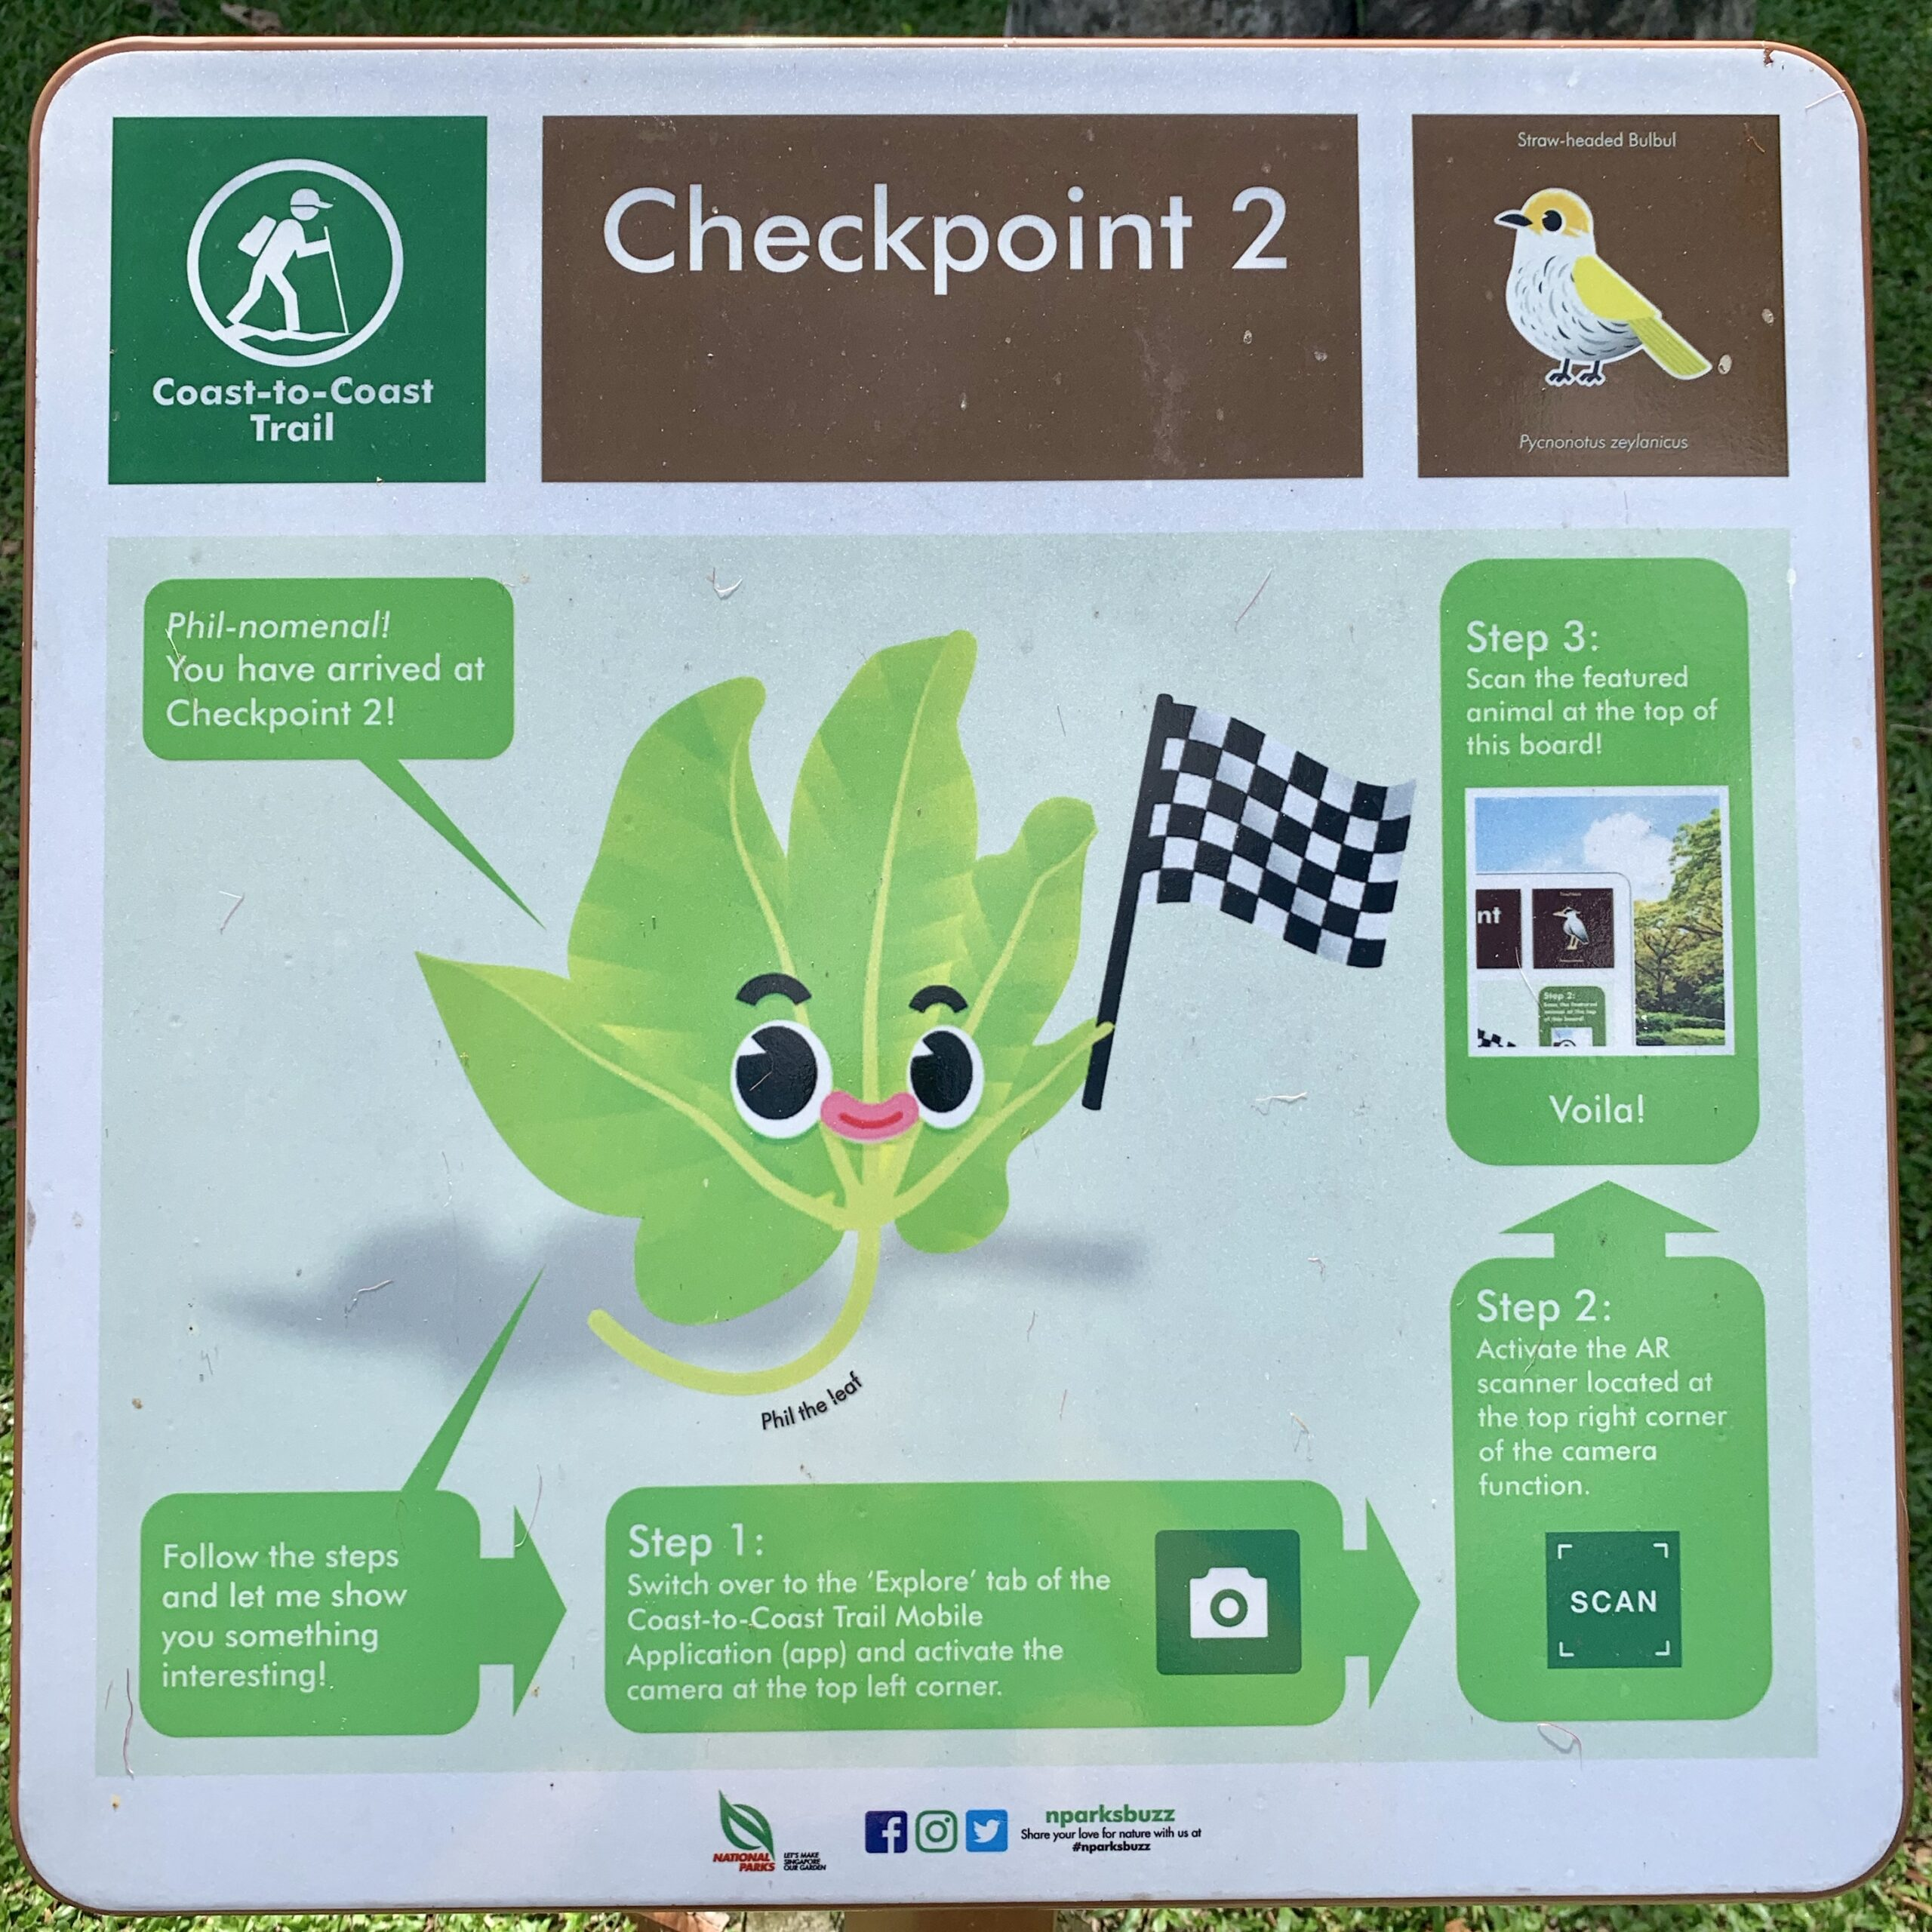 Checkpoint two of Singapore coast to coast trail